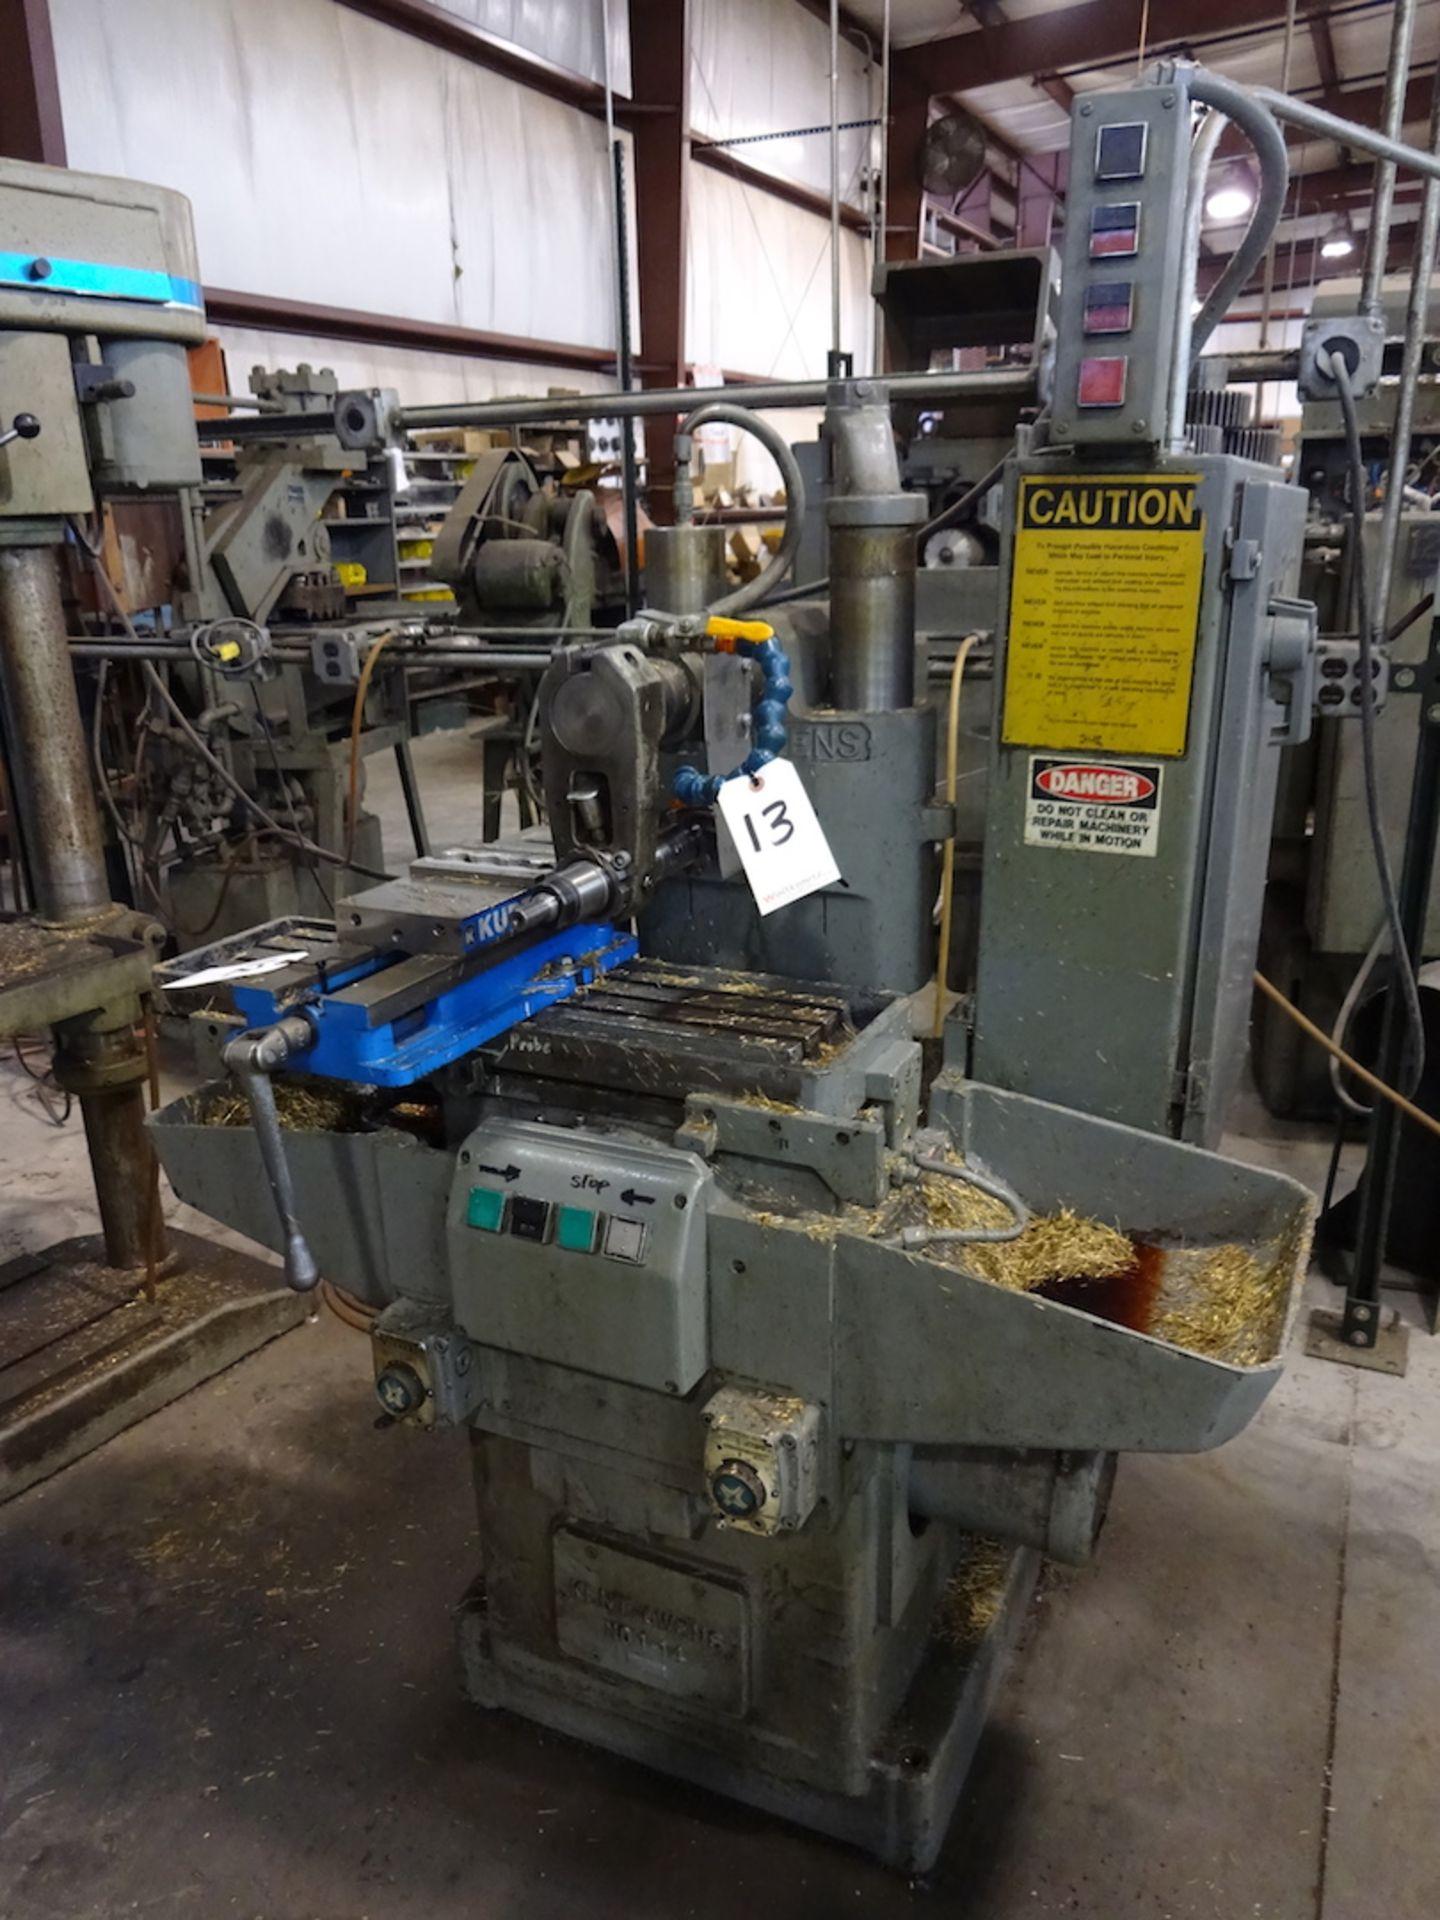 Lot 13 - Kent-Owens No. 1-14 Horizontal Milling Machine, S/N 1-14-1630, 2 HP, 208/220 Volt